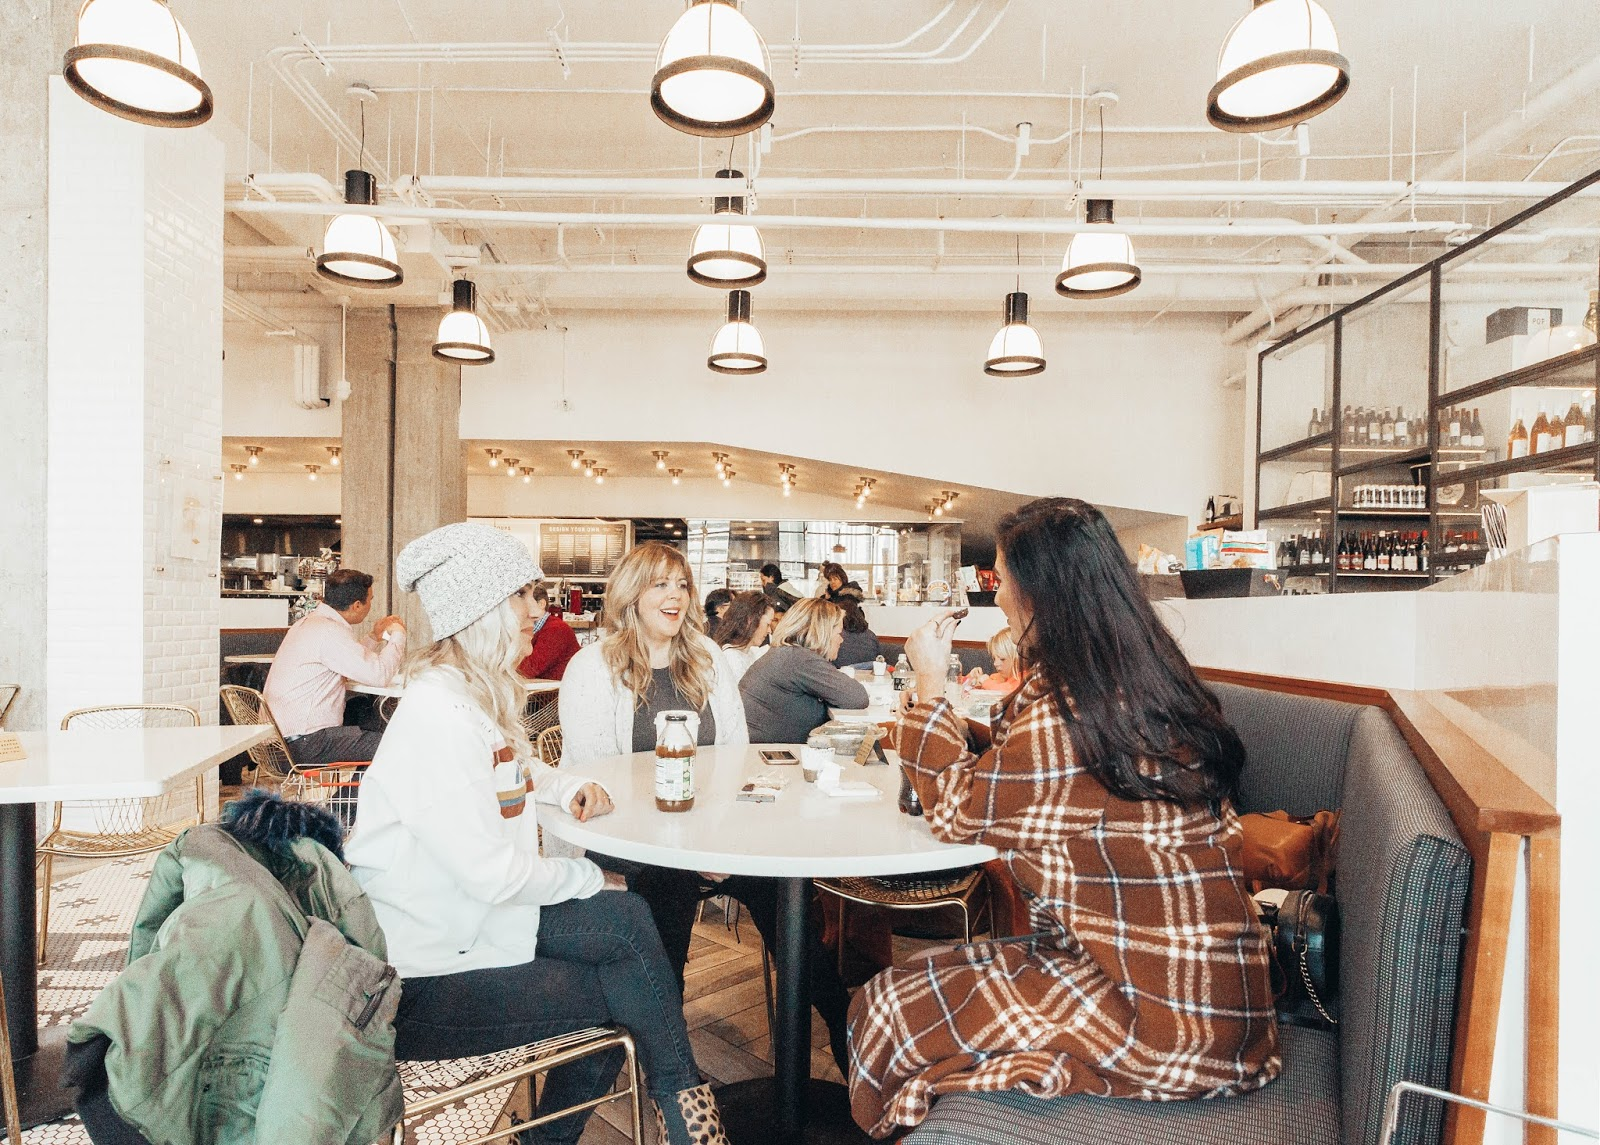 Aerston Staycation Nashville Galentines Eating at Caviar & Bananas.jpg